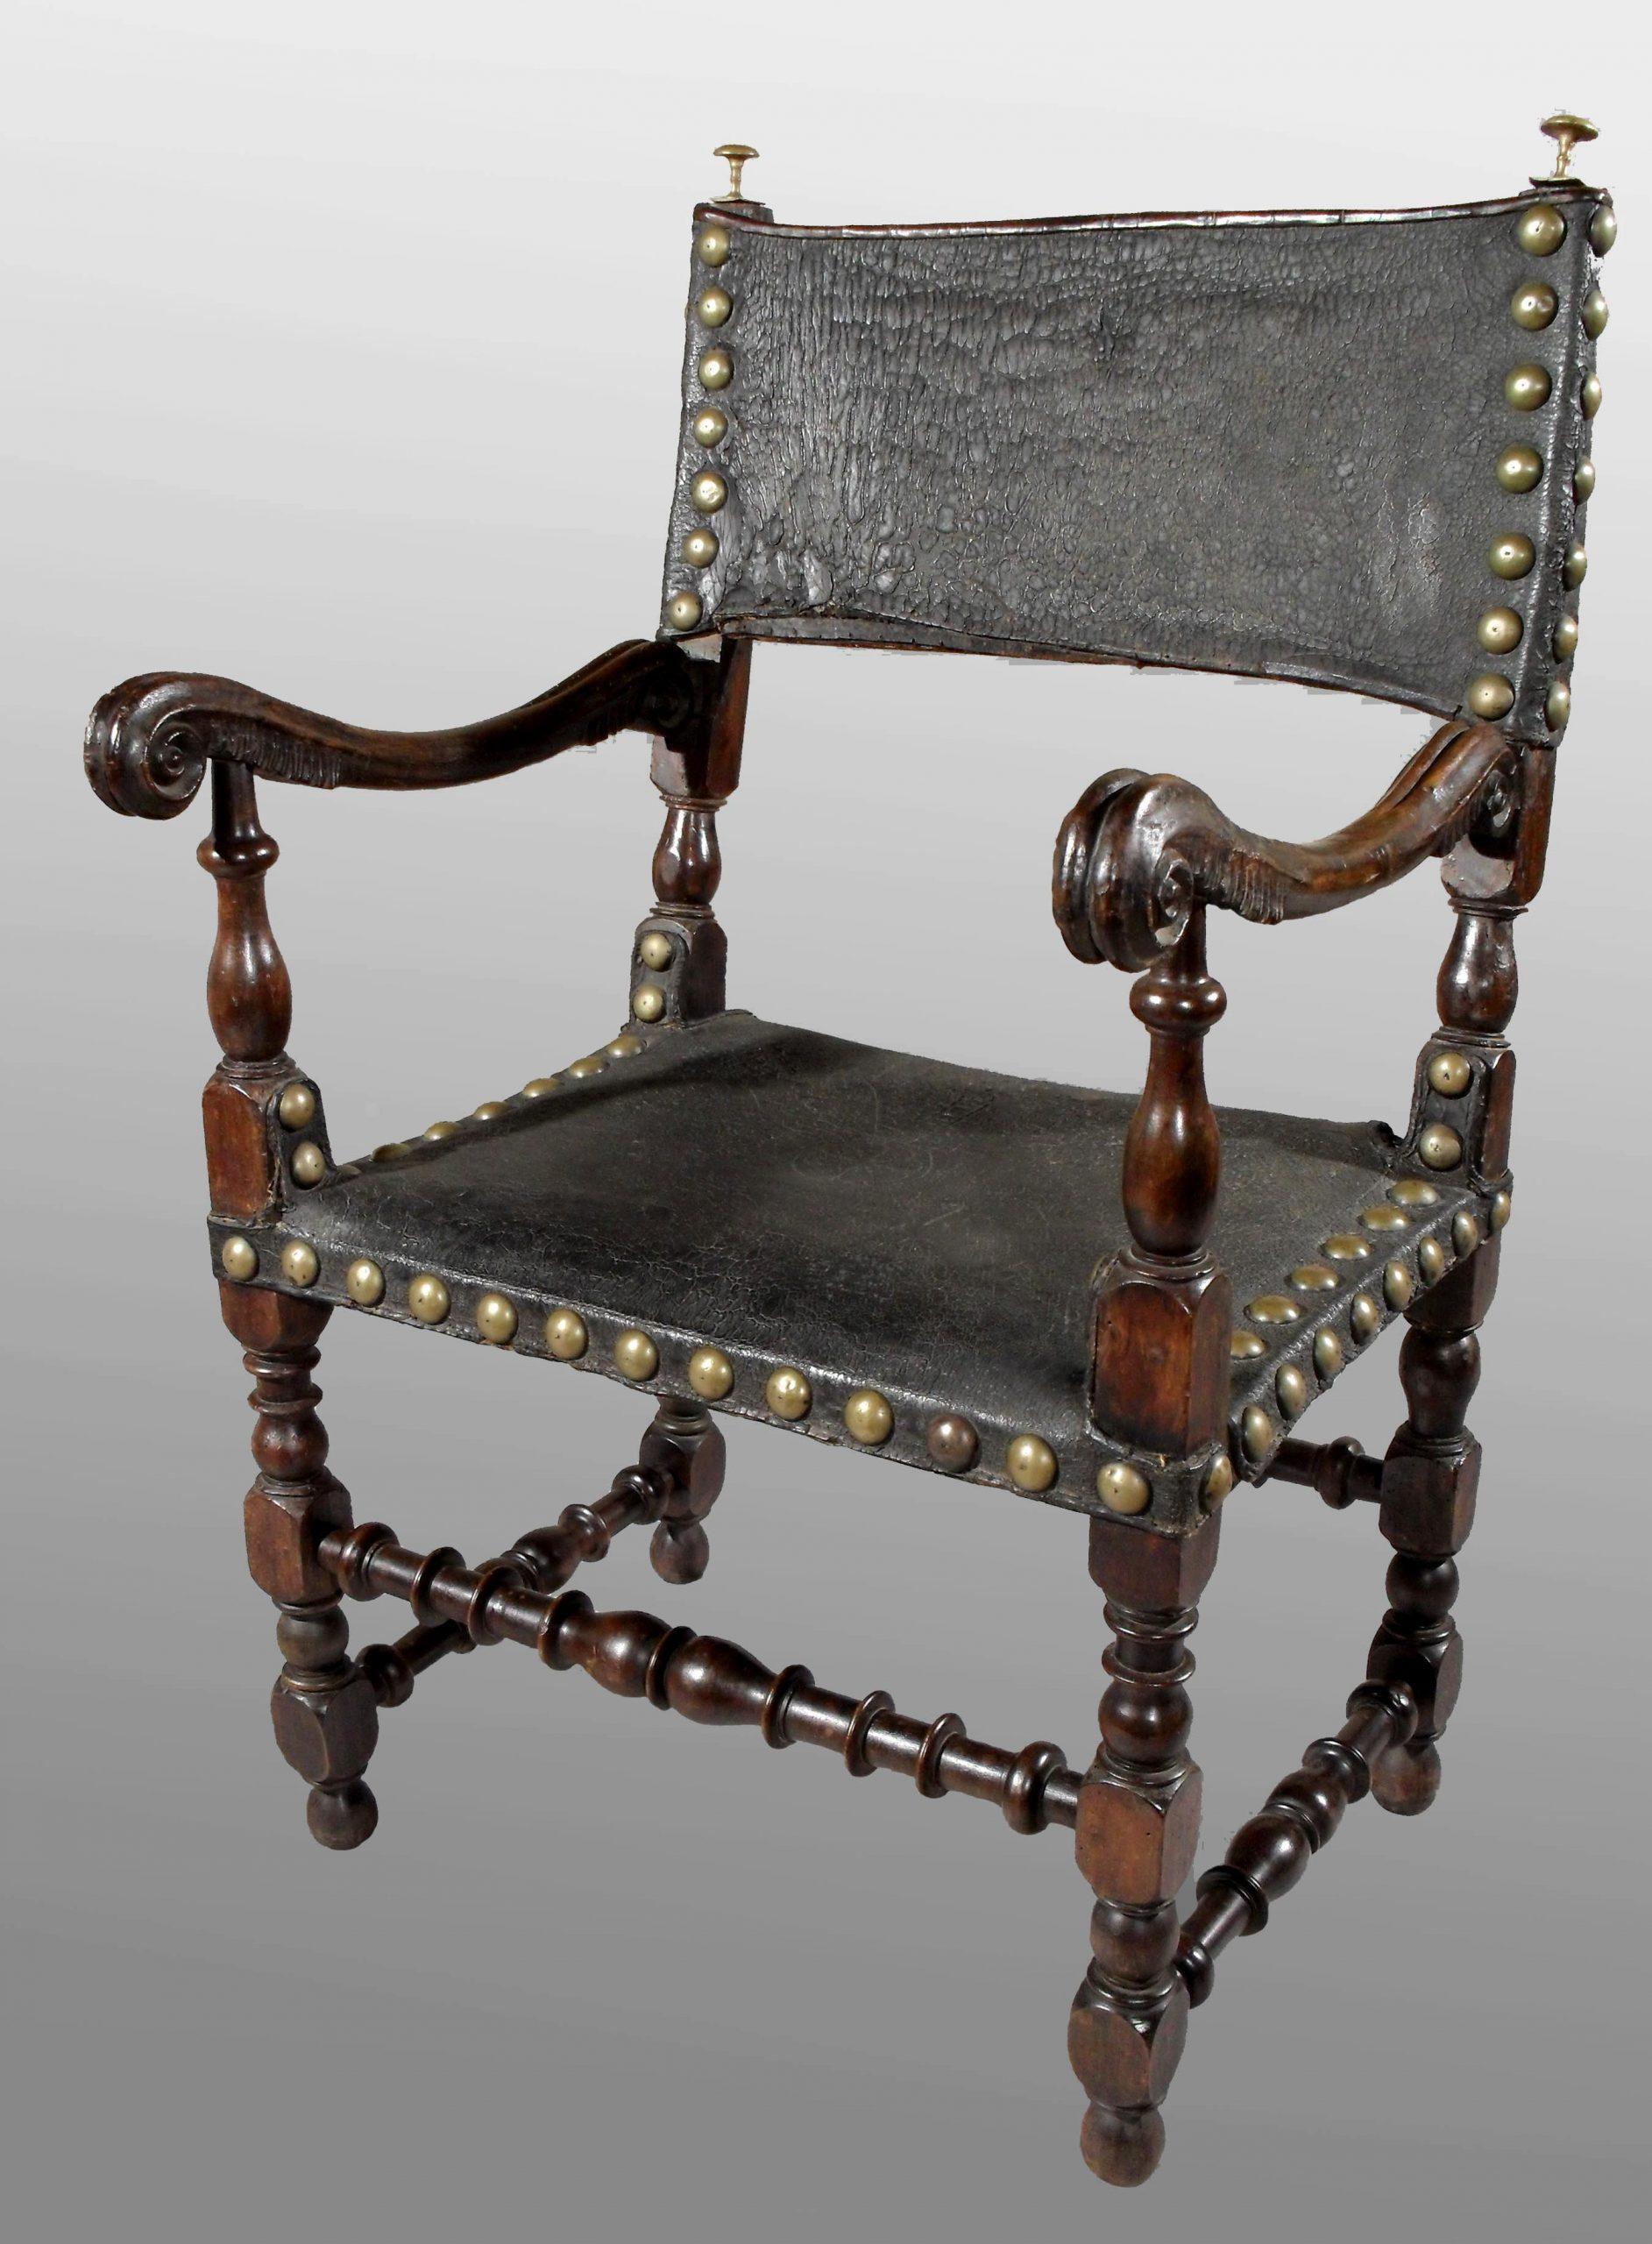 Objeto museológico (cadeira)